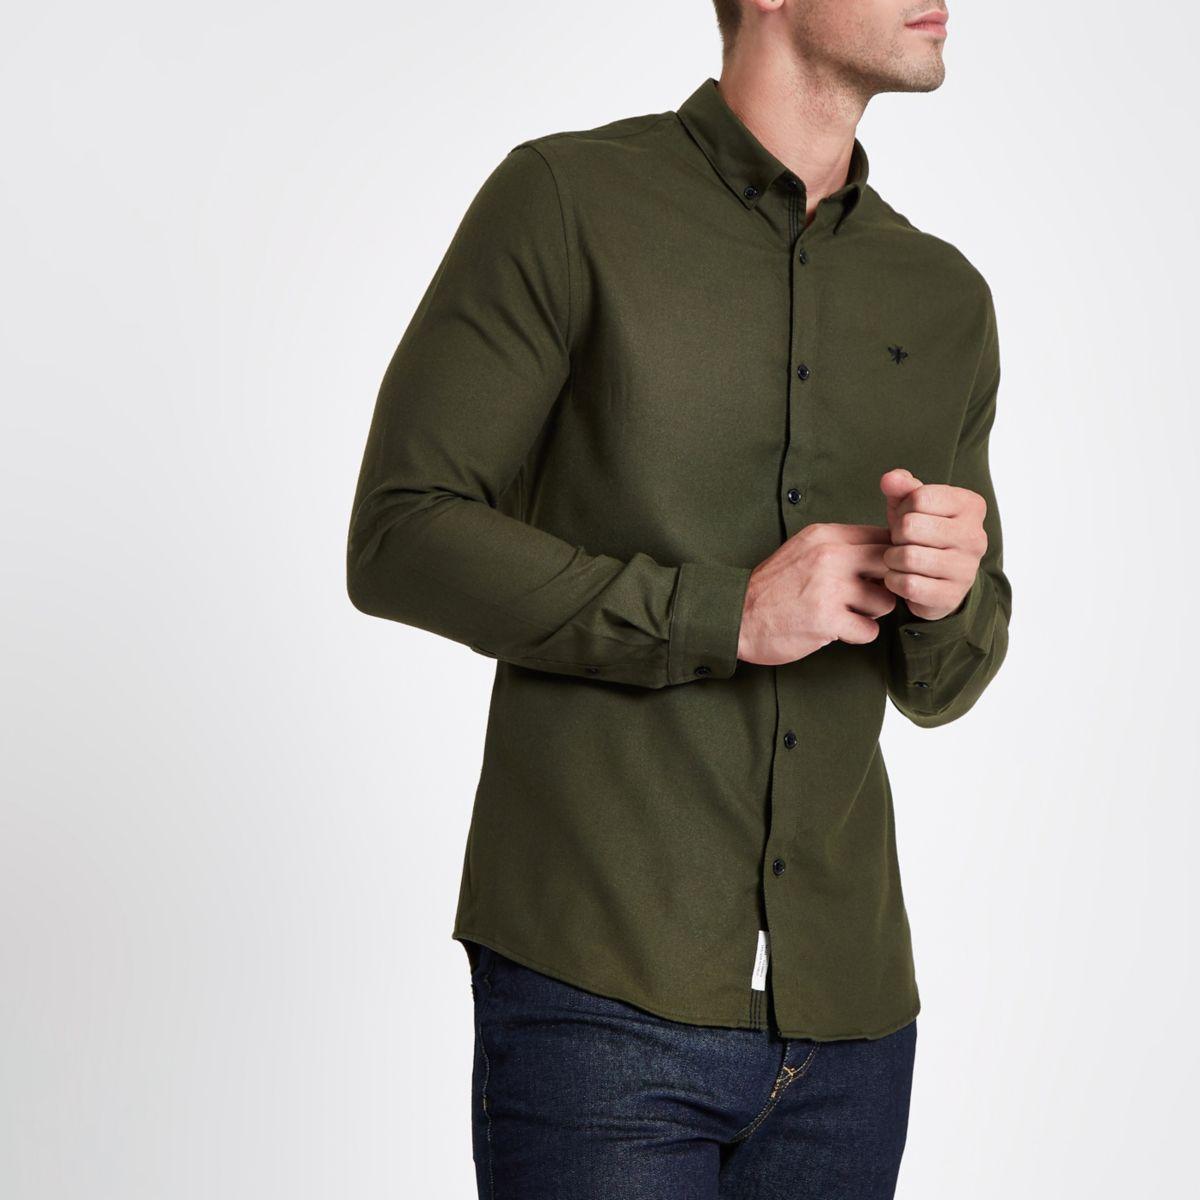 Khaki wasp embroidered long sleeve shirt